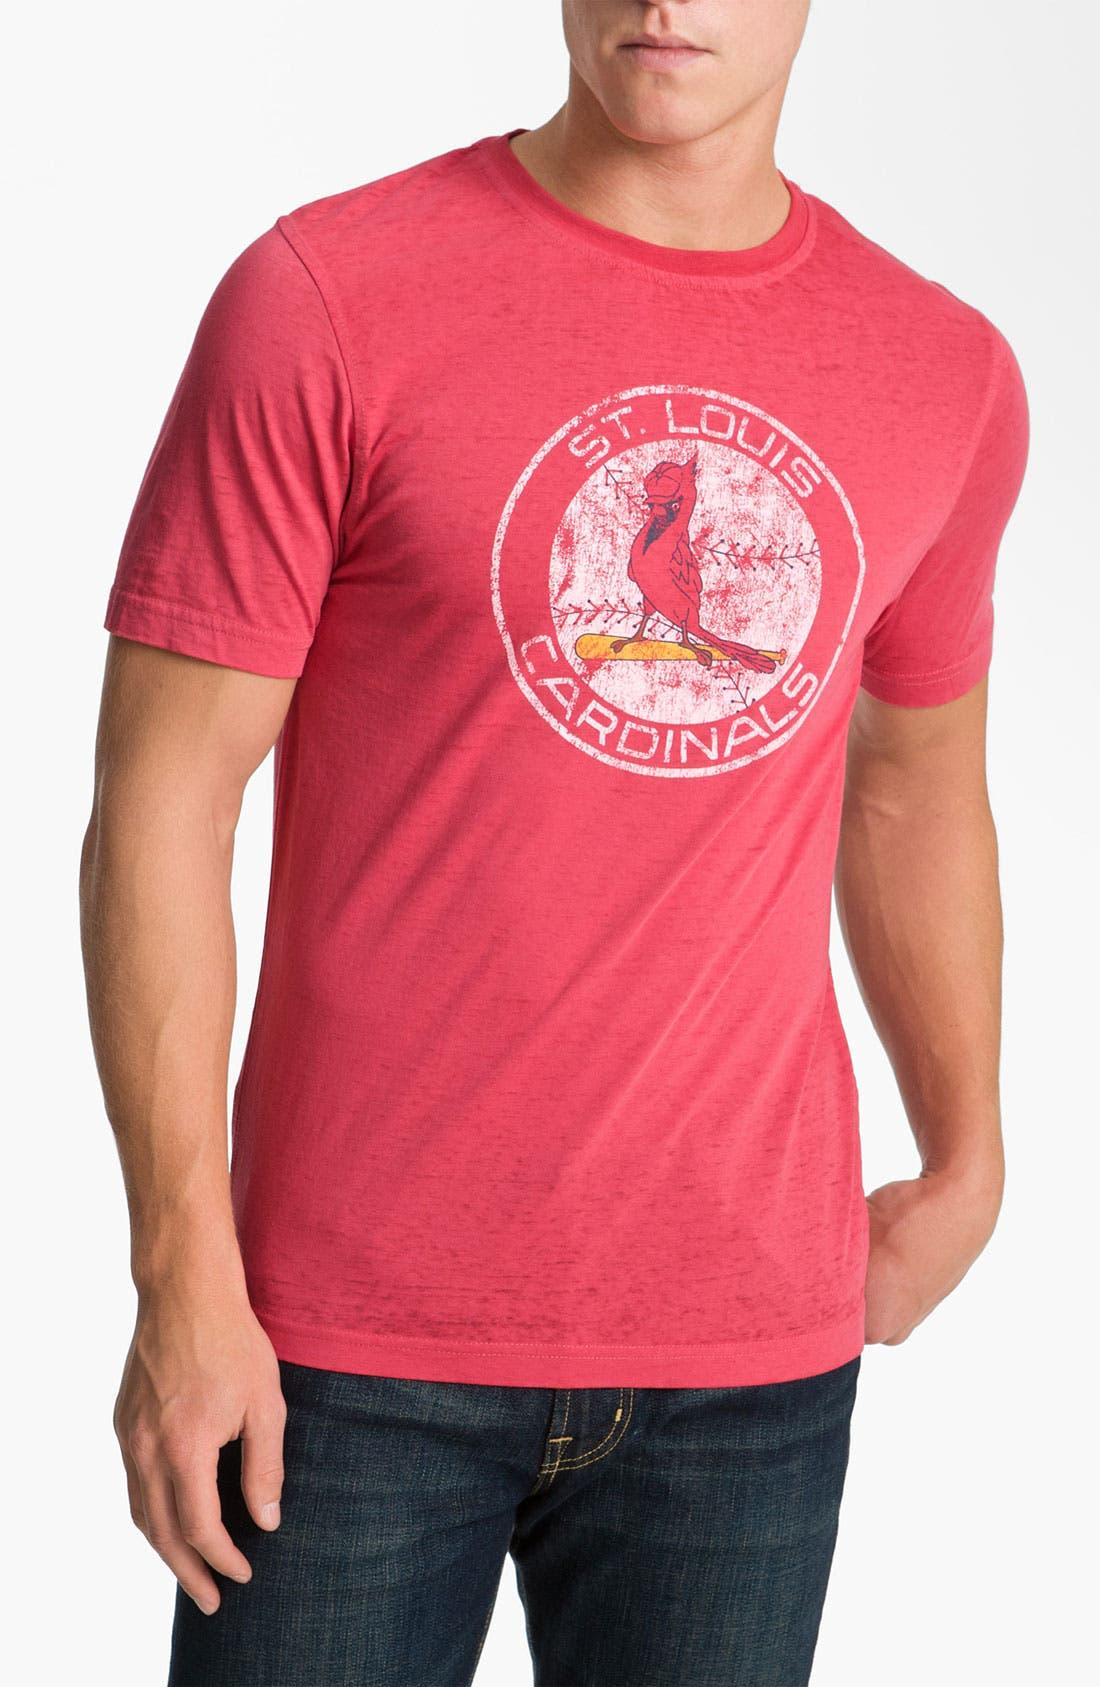 Alternate Image 1 Selected - Red Jacket 'Cardinals - Greenwood' T-Shirt